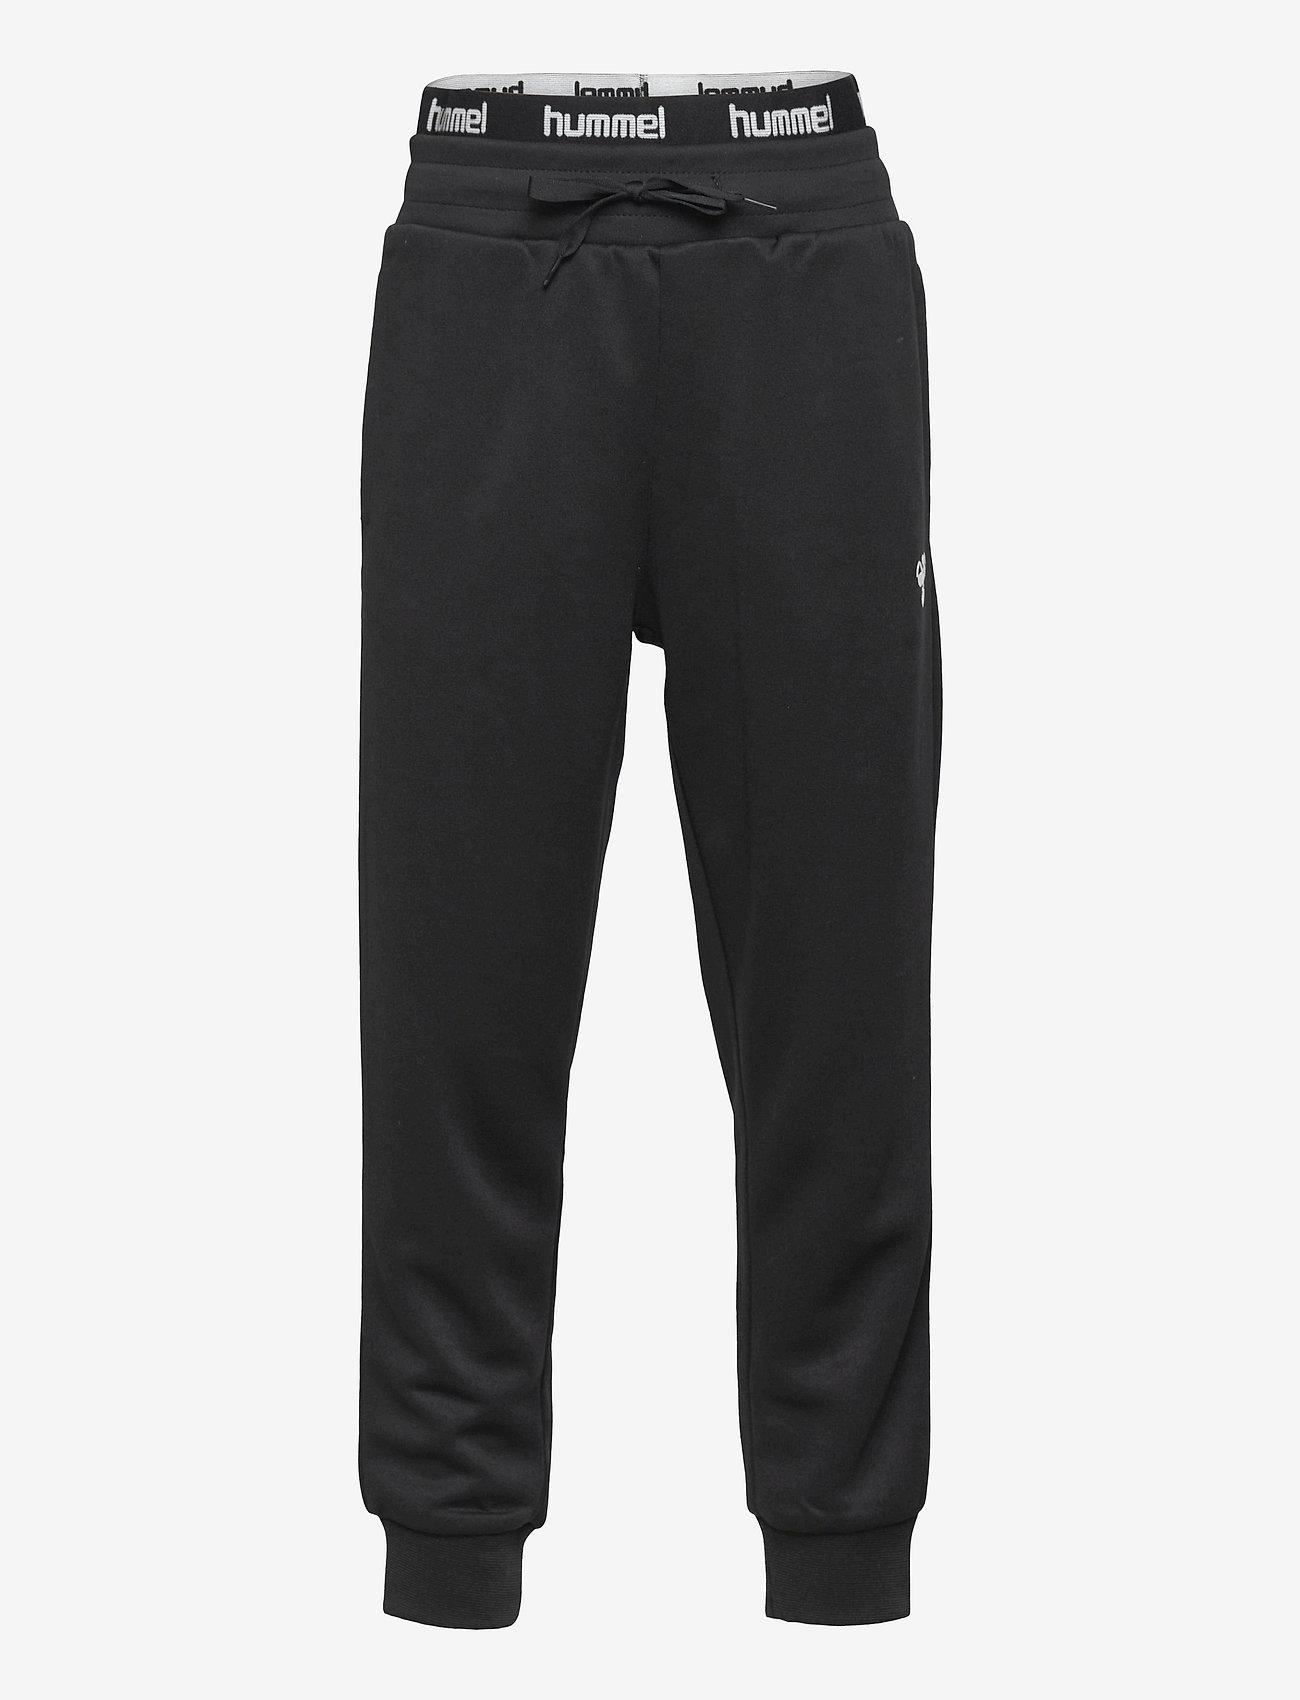 Hummel - hmlNILAR PANTS - sweatpants - black - 0